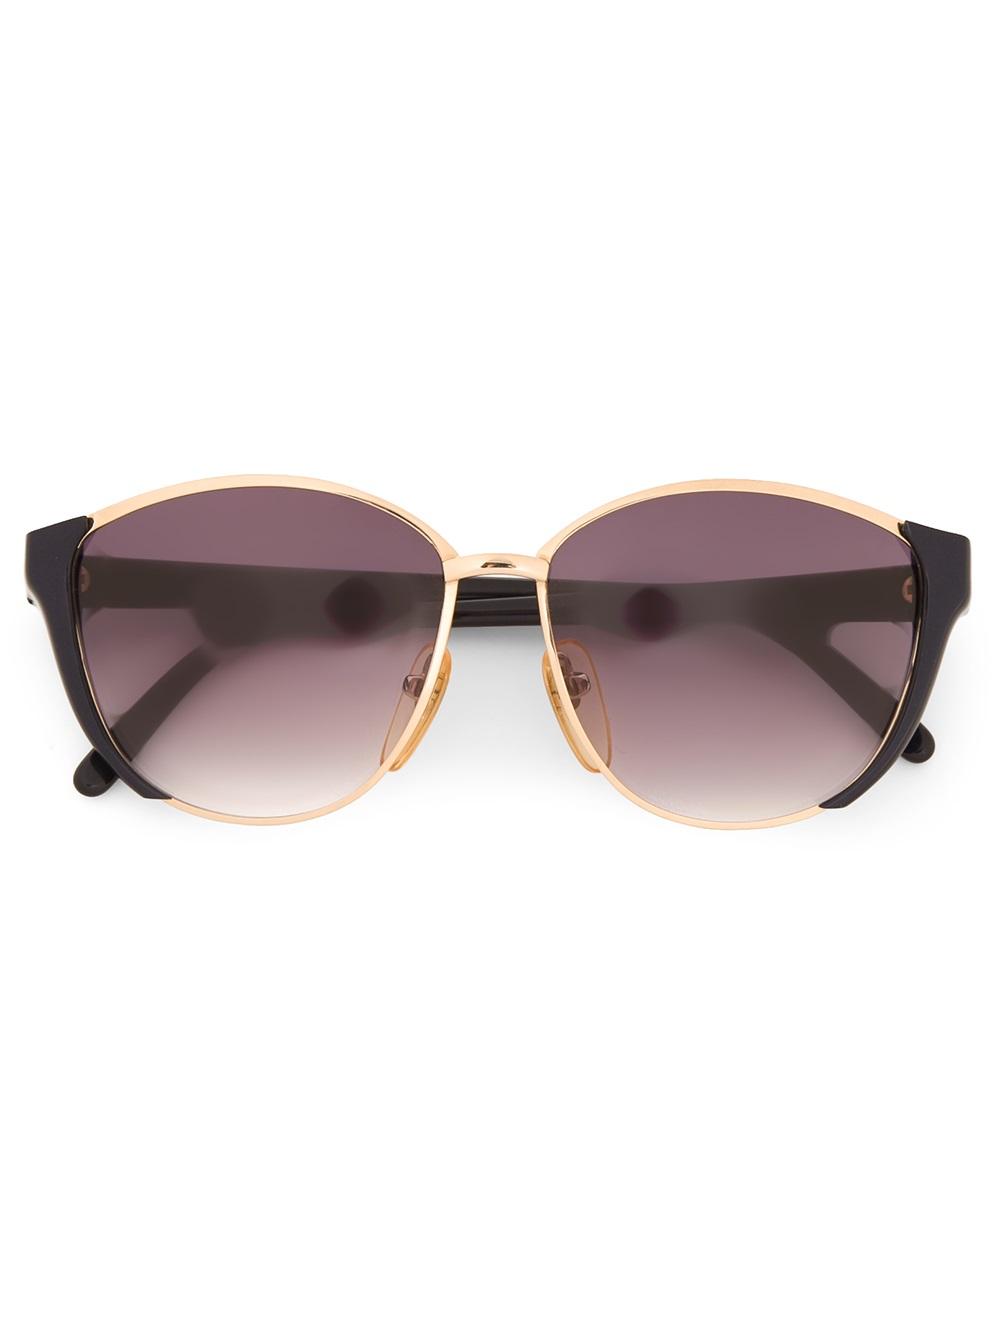 Vintage Round Gold Frame Sunglasses : Valentino Vintage Round Frame Sunglasses in Gold (black ...